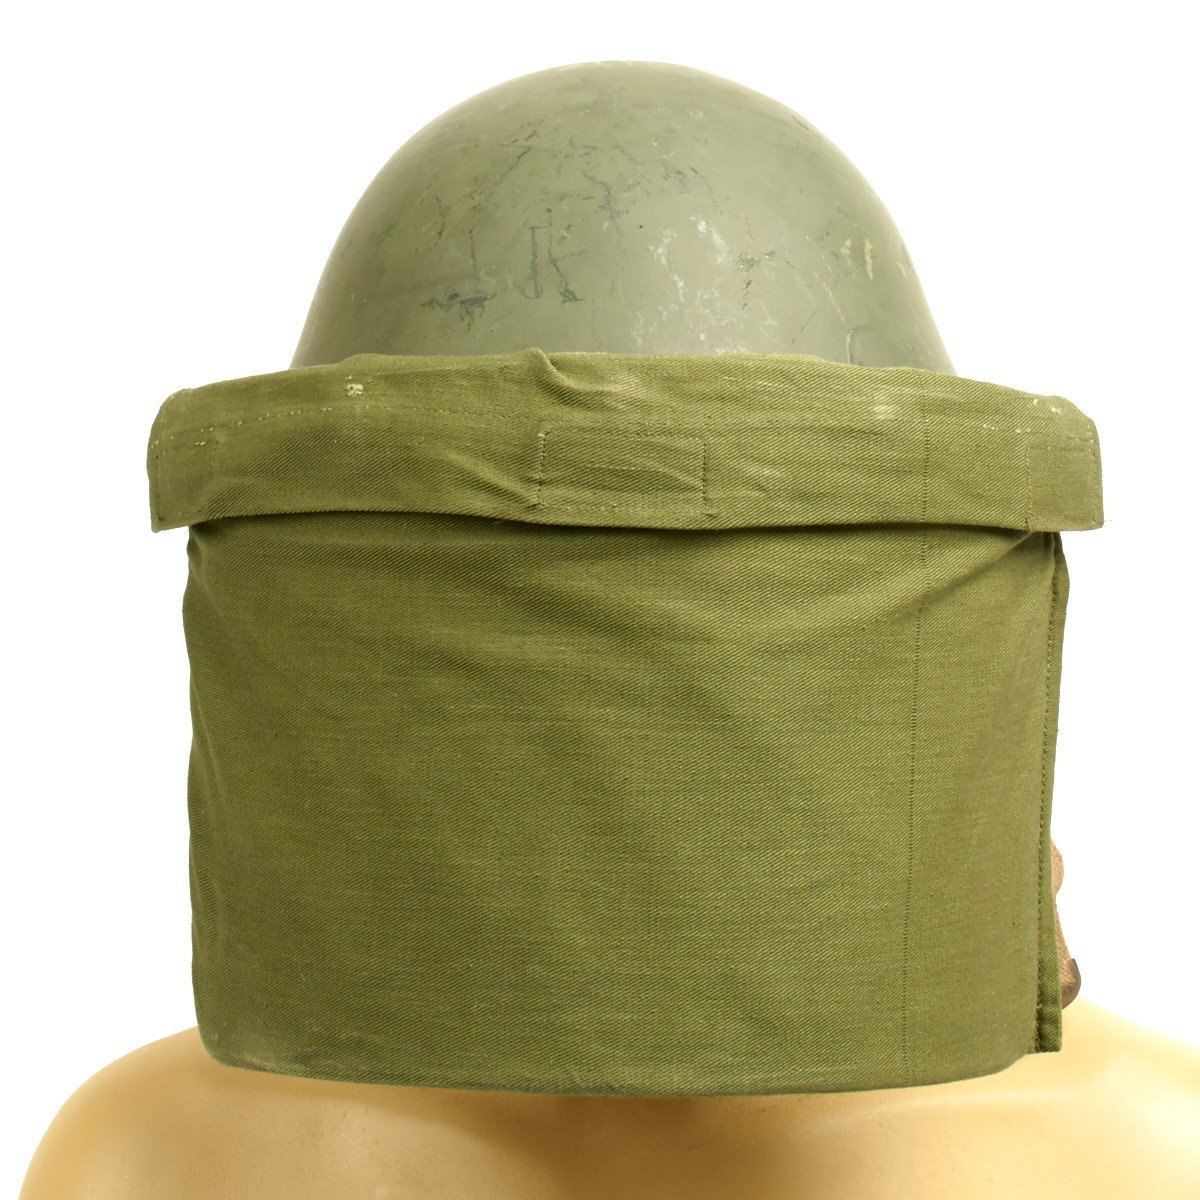 Cover Only Original British Cloth Visor Cover for P-1944 Turtle Riot Helmet